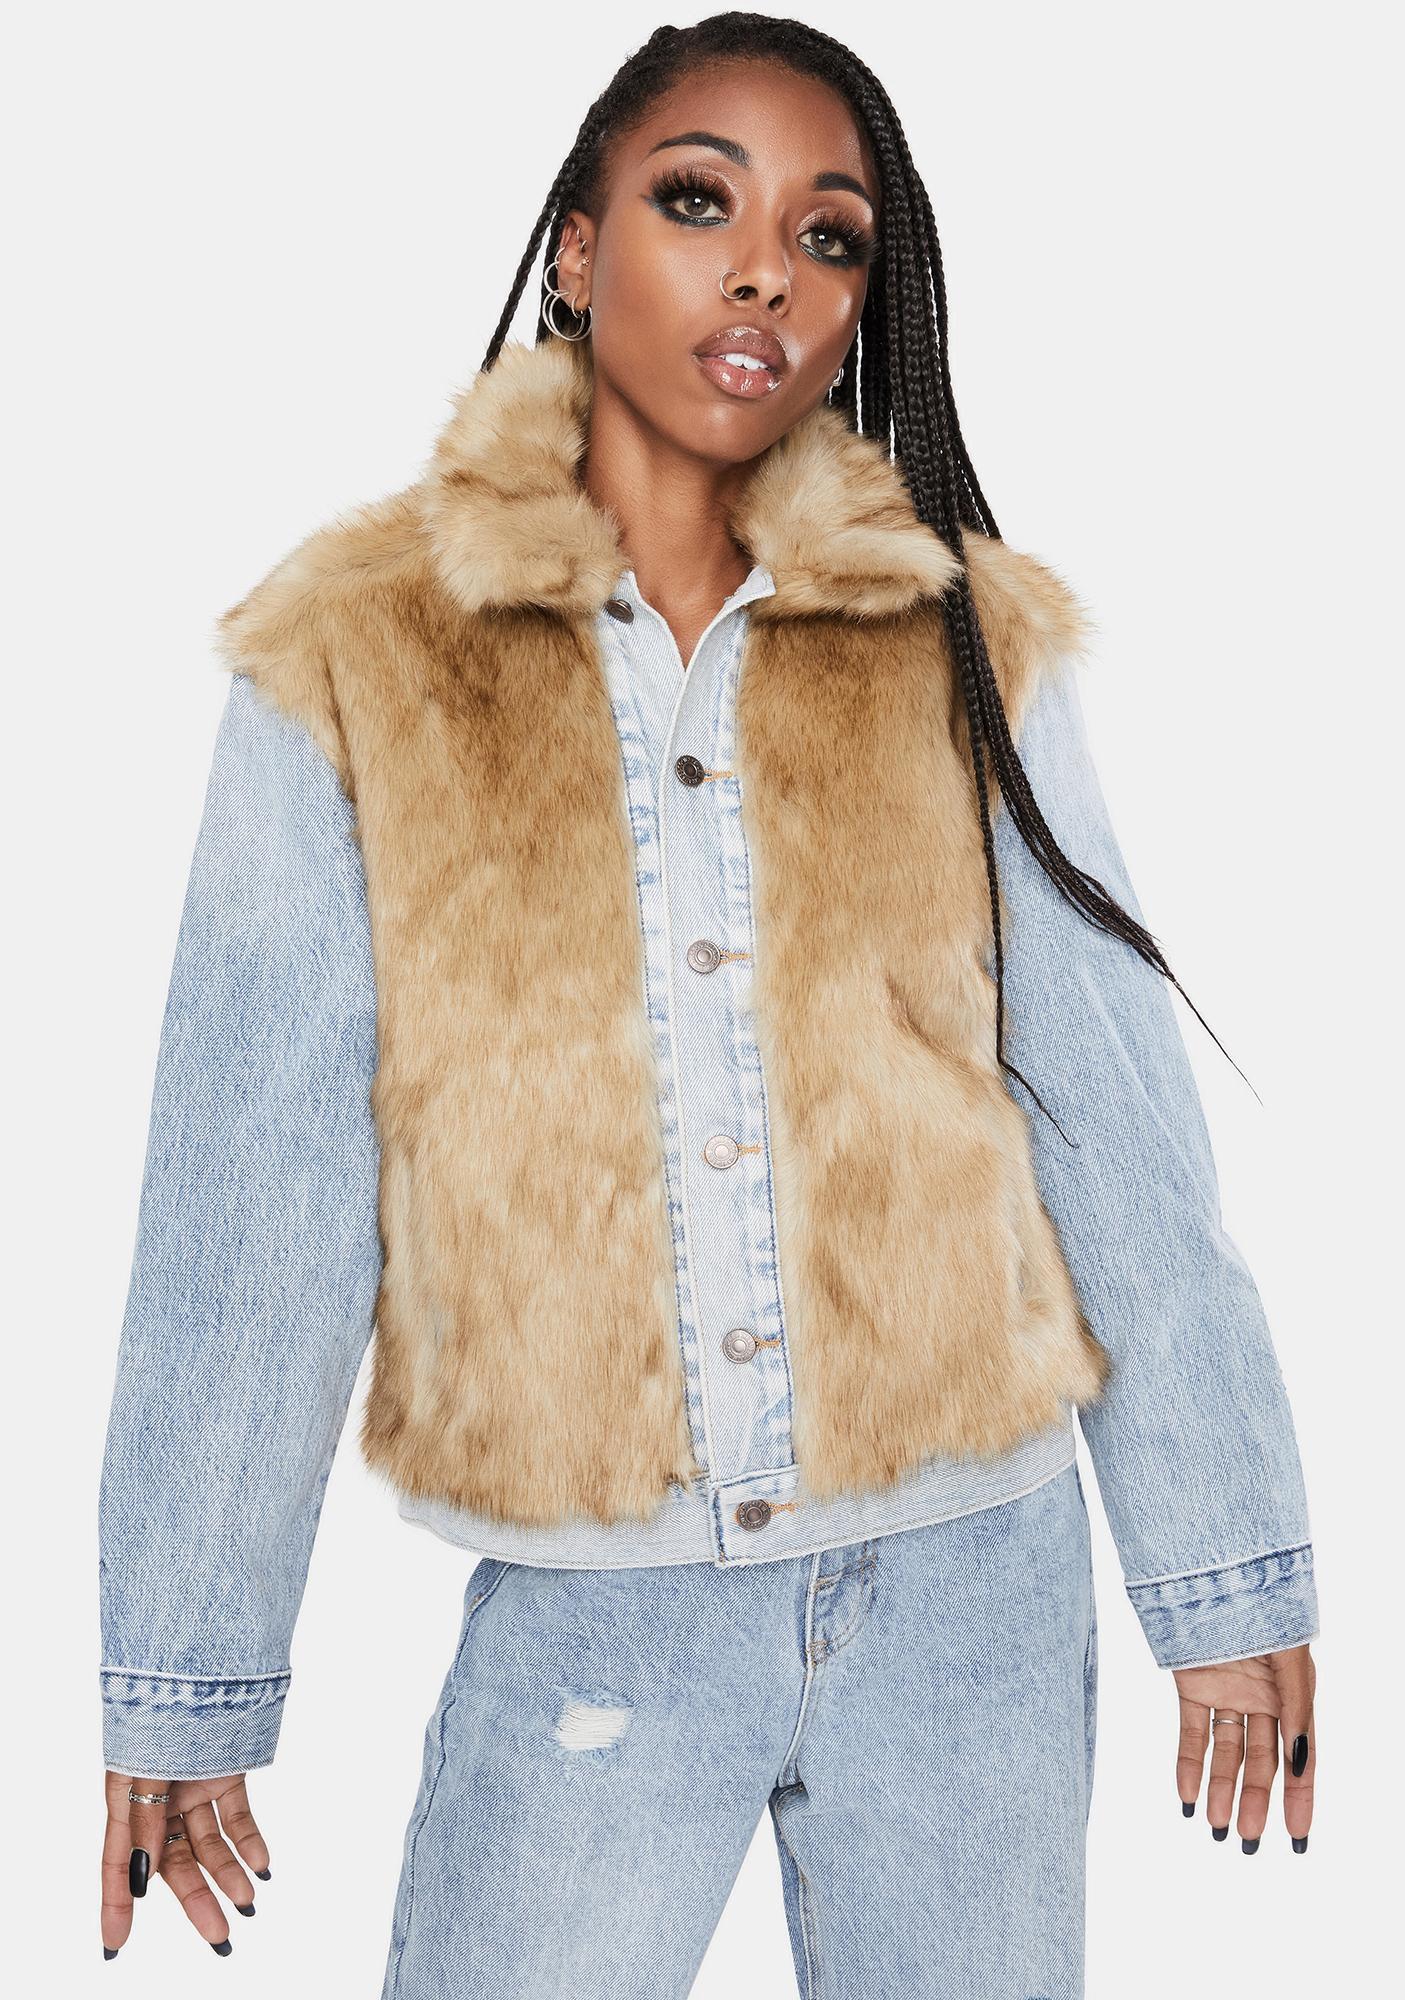 Levis Furry Fury Oversized Trucker Jacket